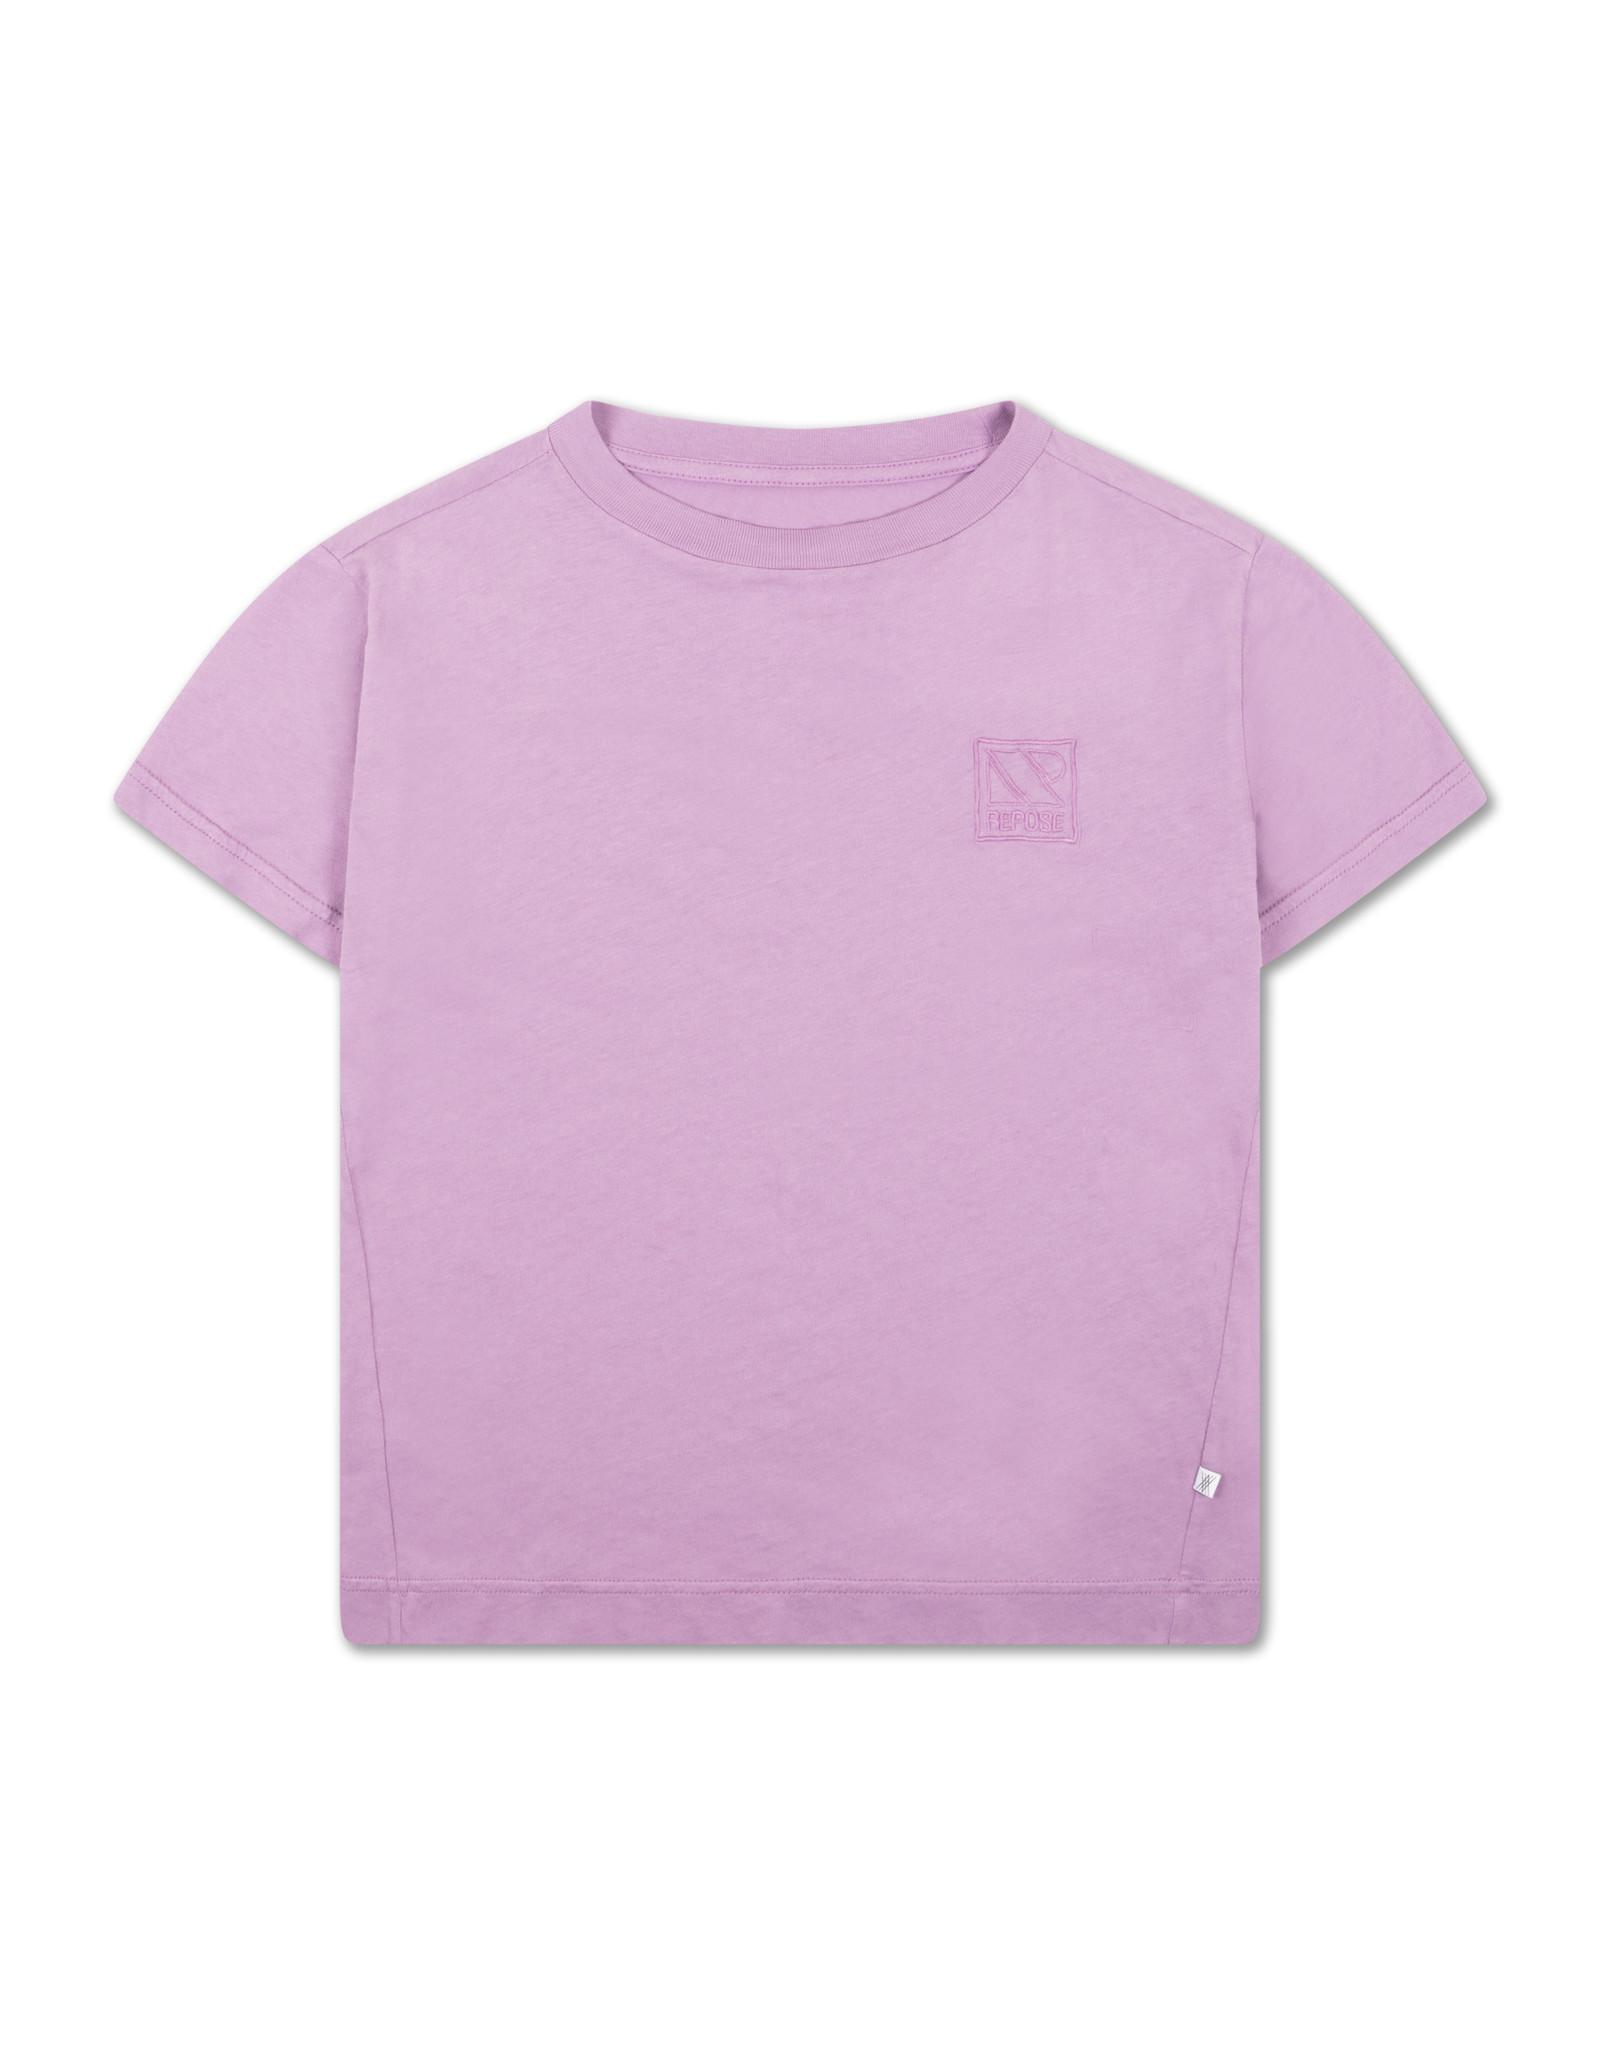 Repose Repose SS21 51 Tee greyish violet